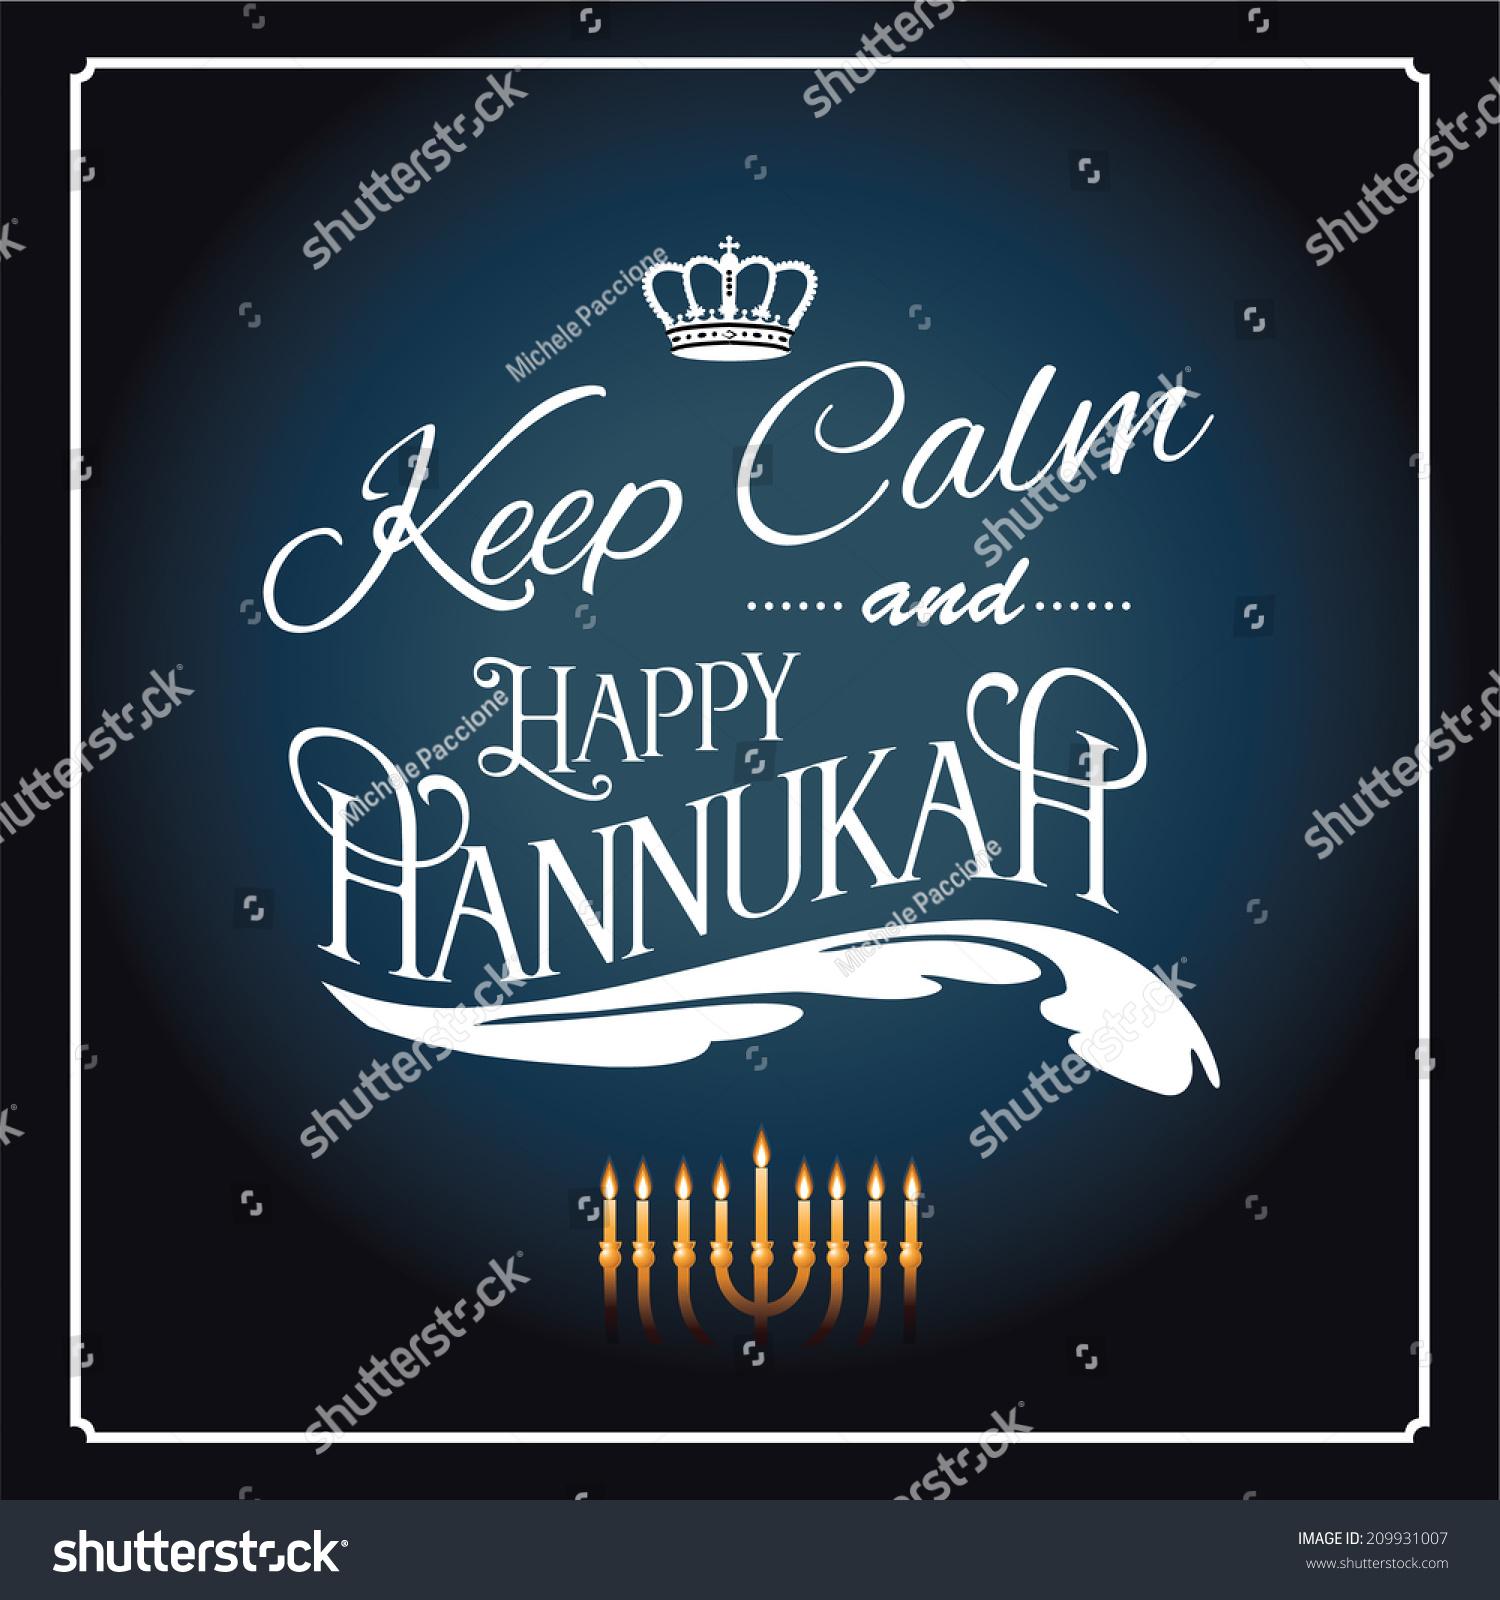 Keep Calm Happy Hanukkah Design Eps Stock Vector 209931007